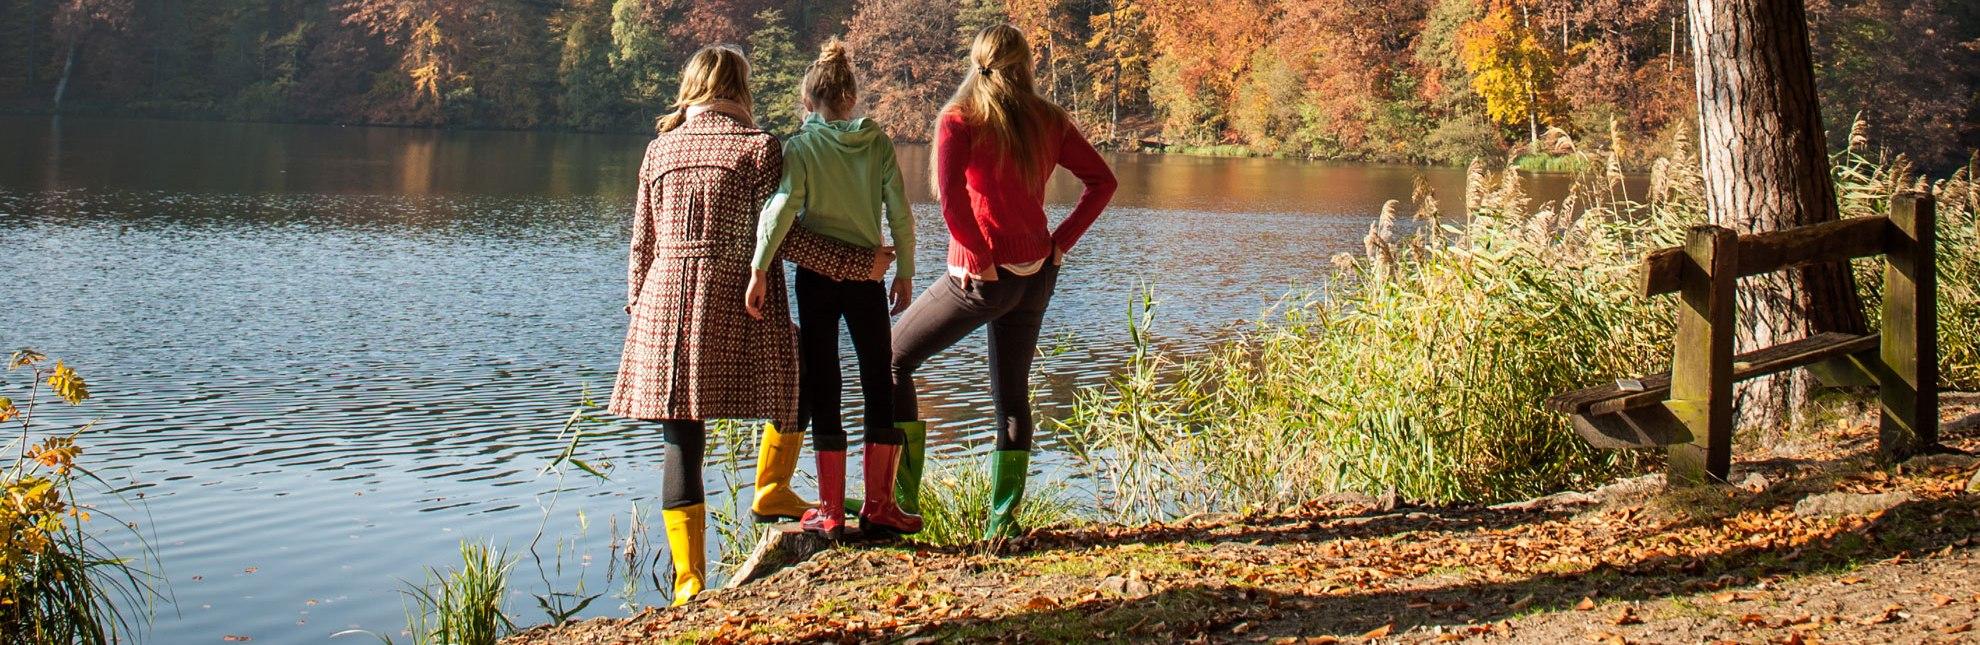 Herbstimpression am Schmalsee, © Nicole Franke/HLMS